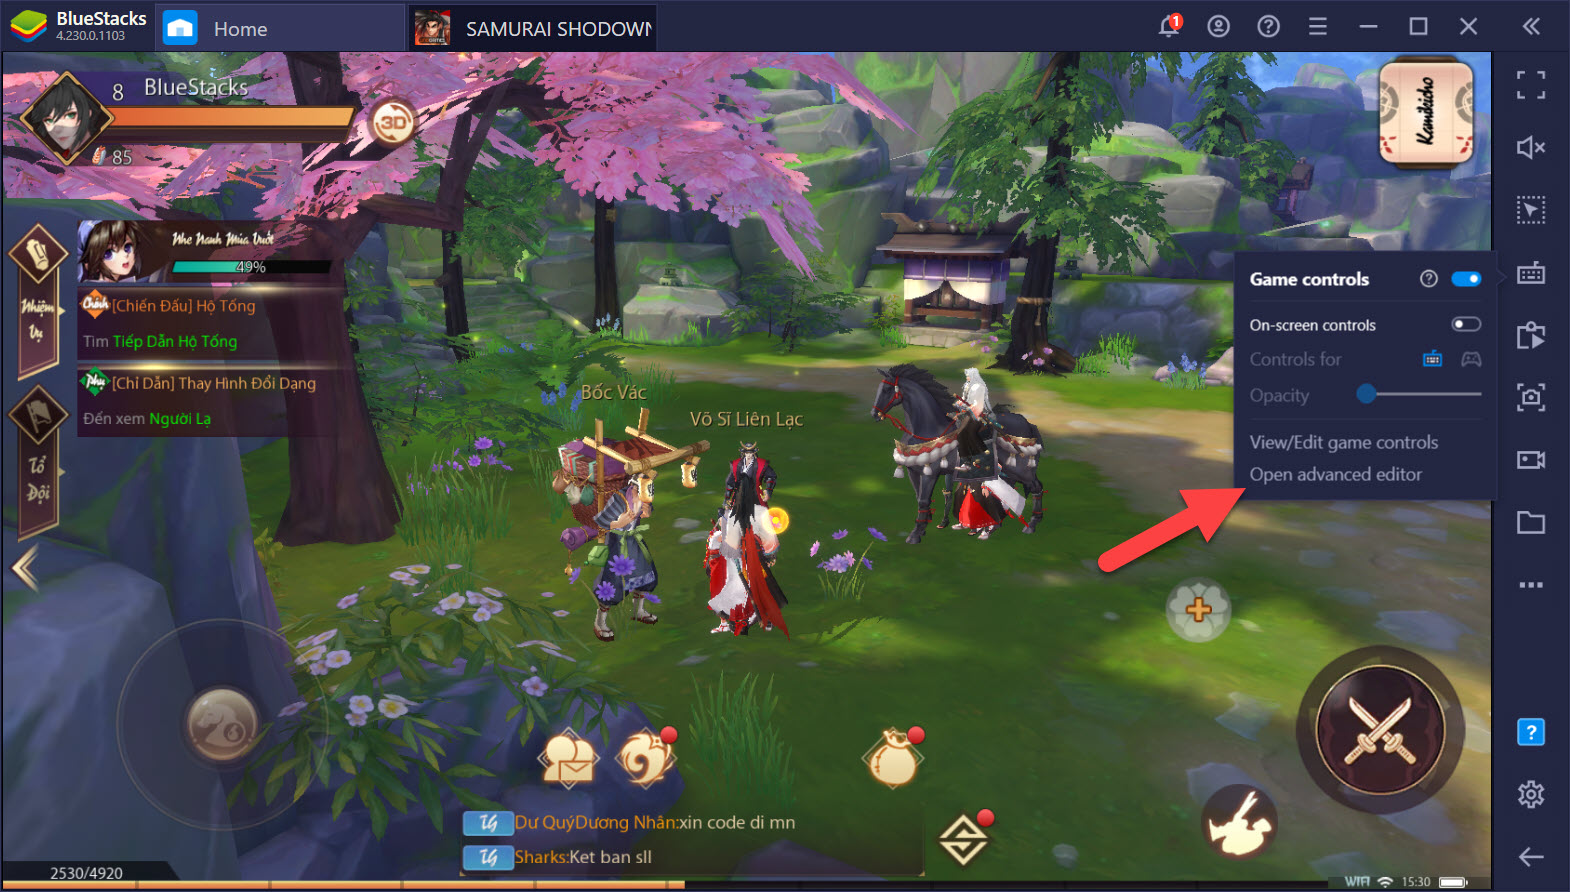 Tối ưu Combo trong SAMURAI SHODOWN: The Legend of Samurai với Game Controls của BlueStacks